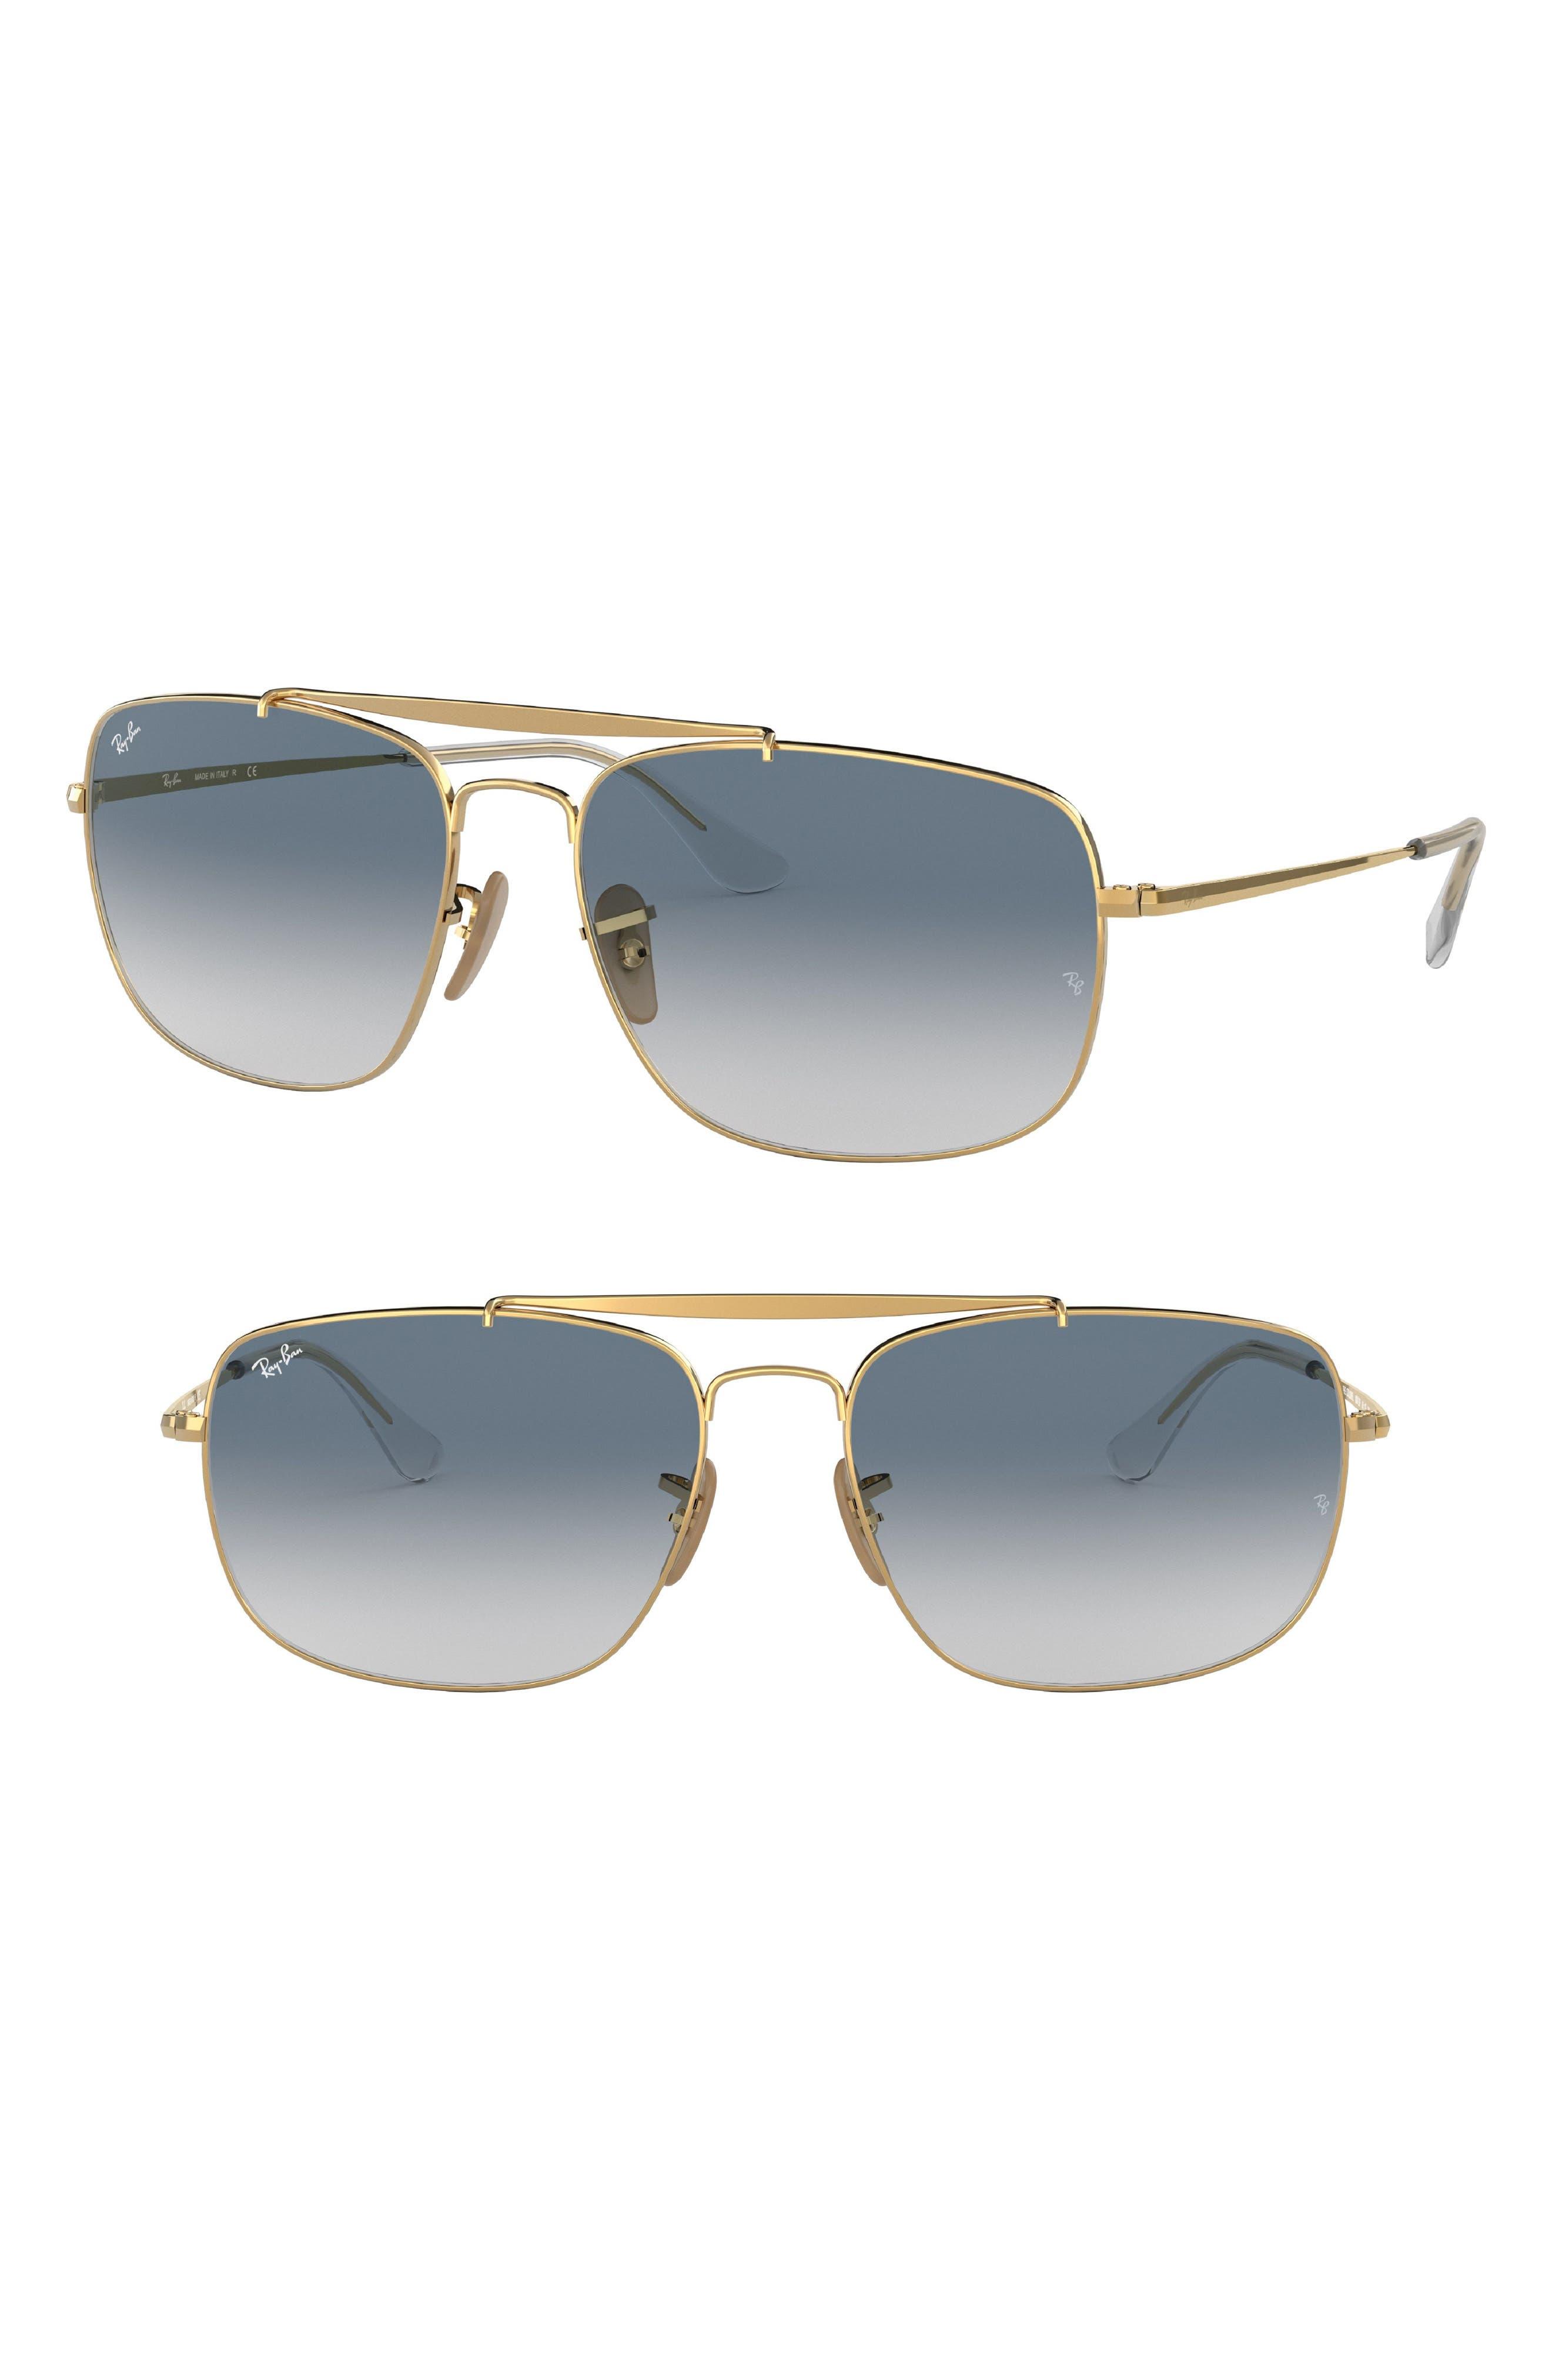 Ray-Ban The Colonel 61Mm Aviator Sunglasses - Gold